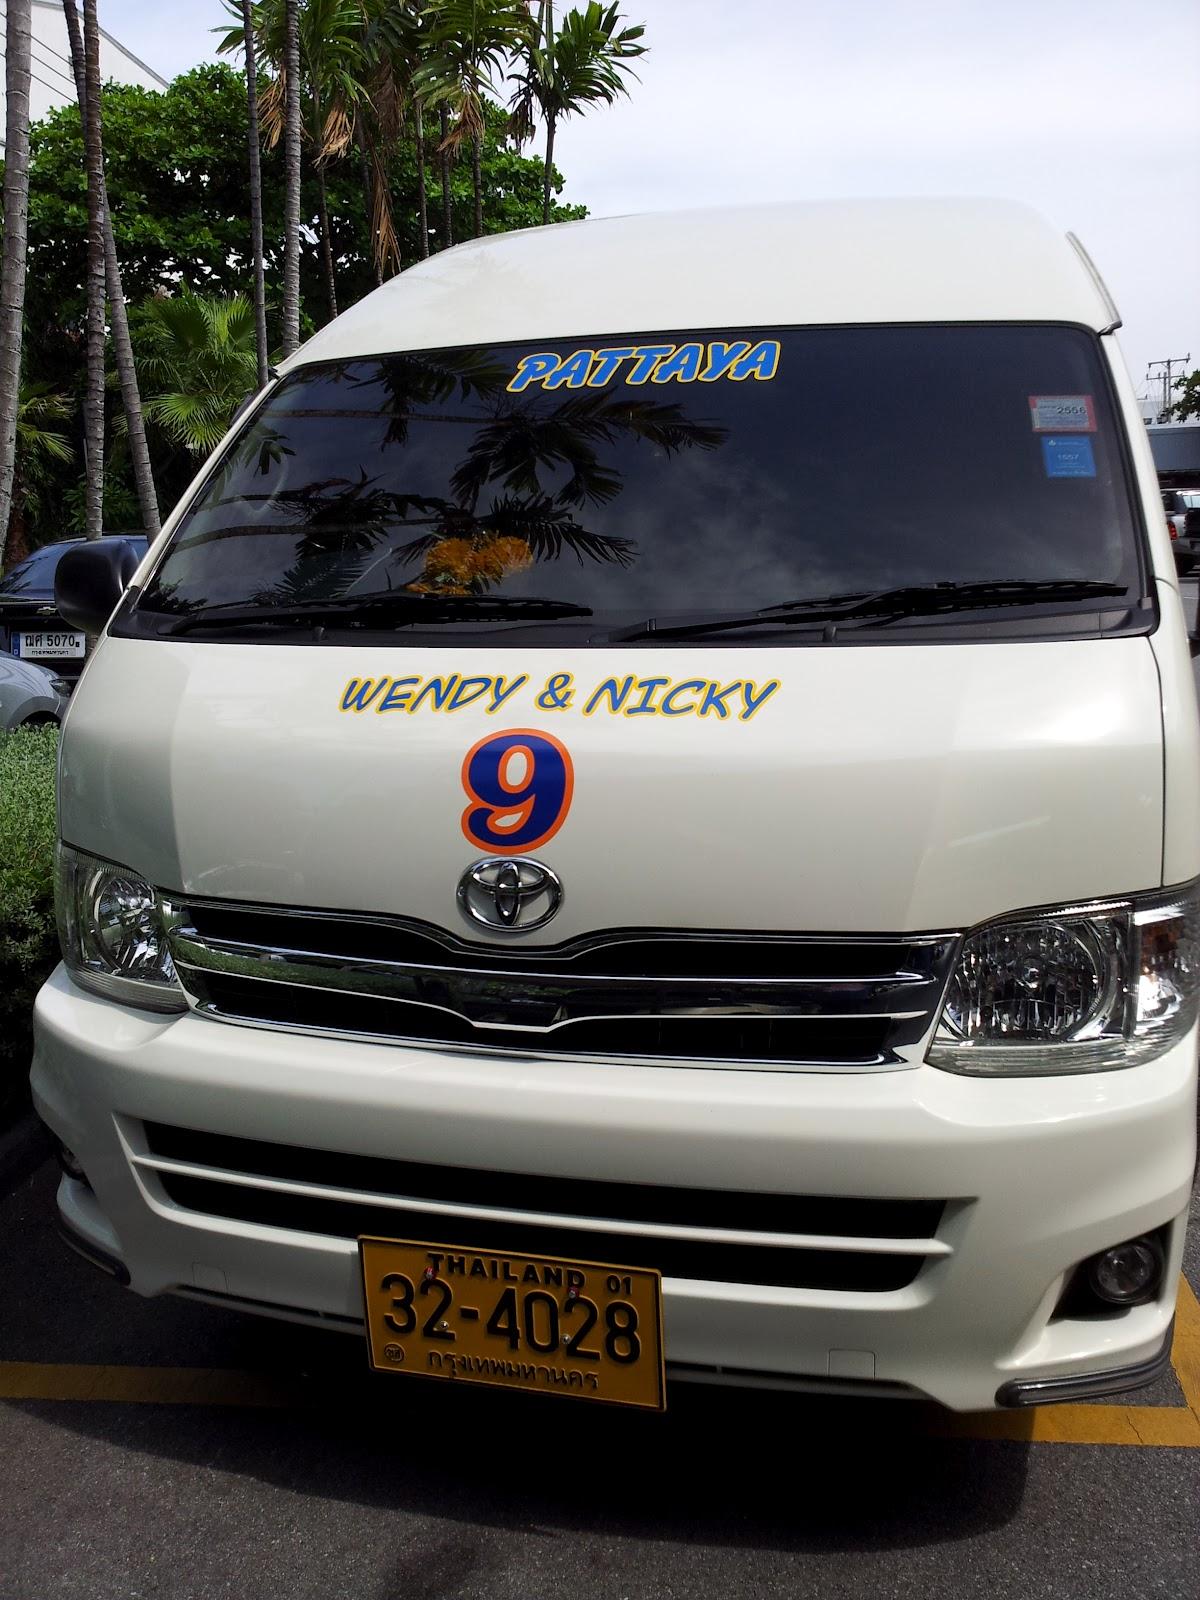 Travel @ Pattaya Thailand: Transportation from airport to Pattaya/ 曼谷機場去芭堤雅